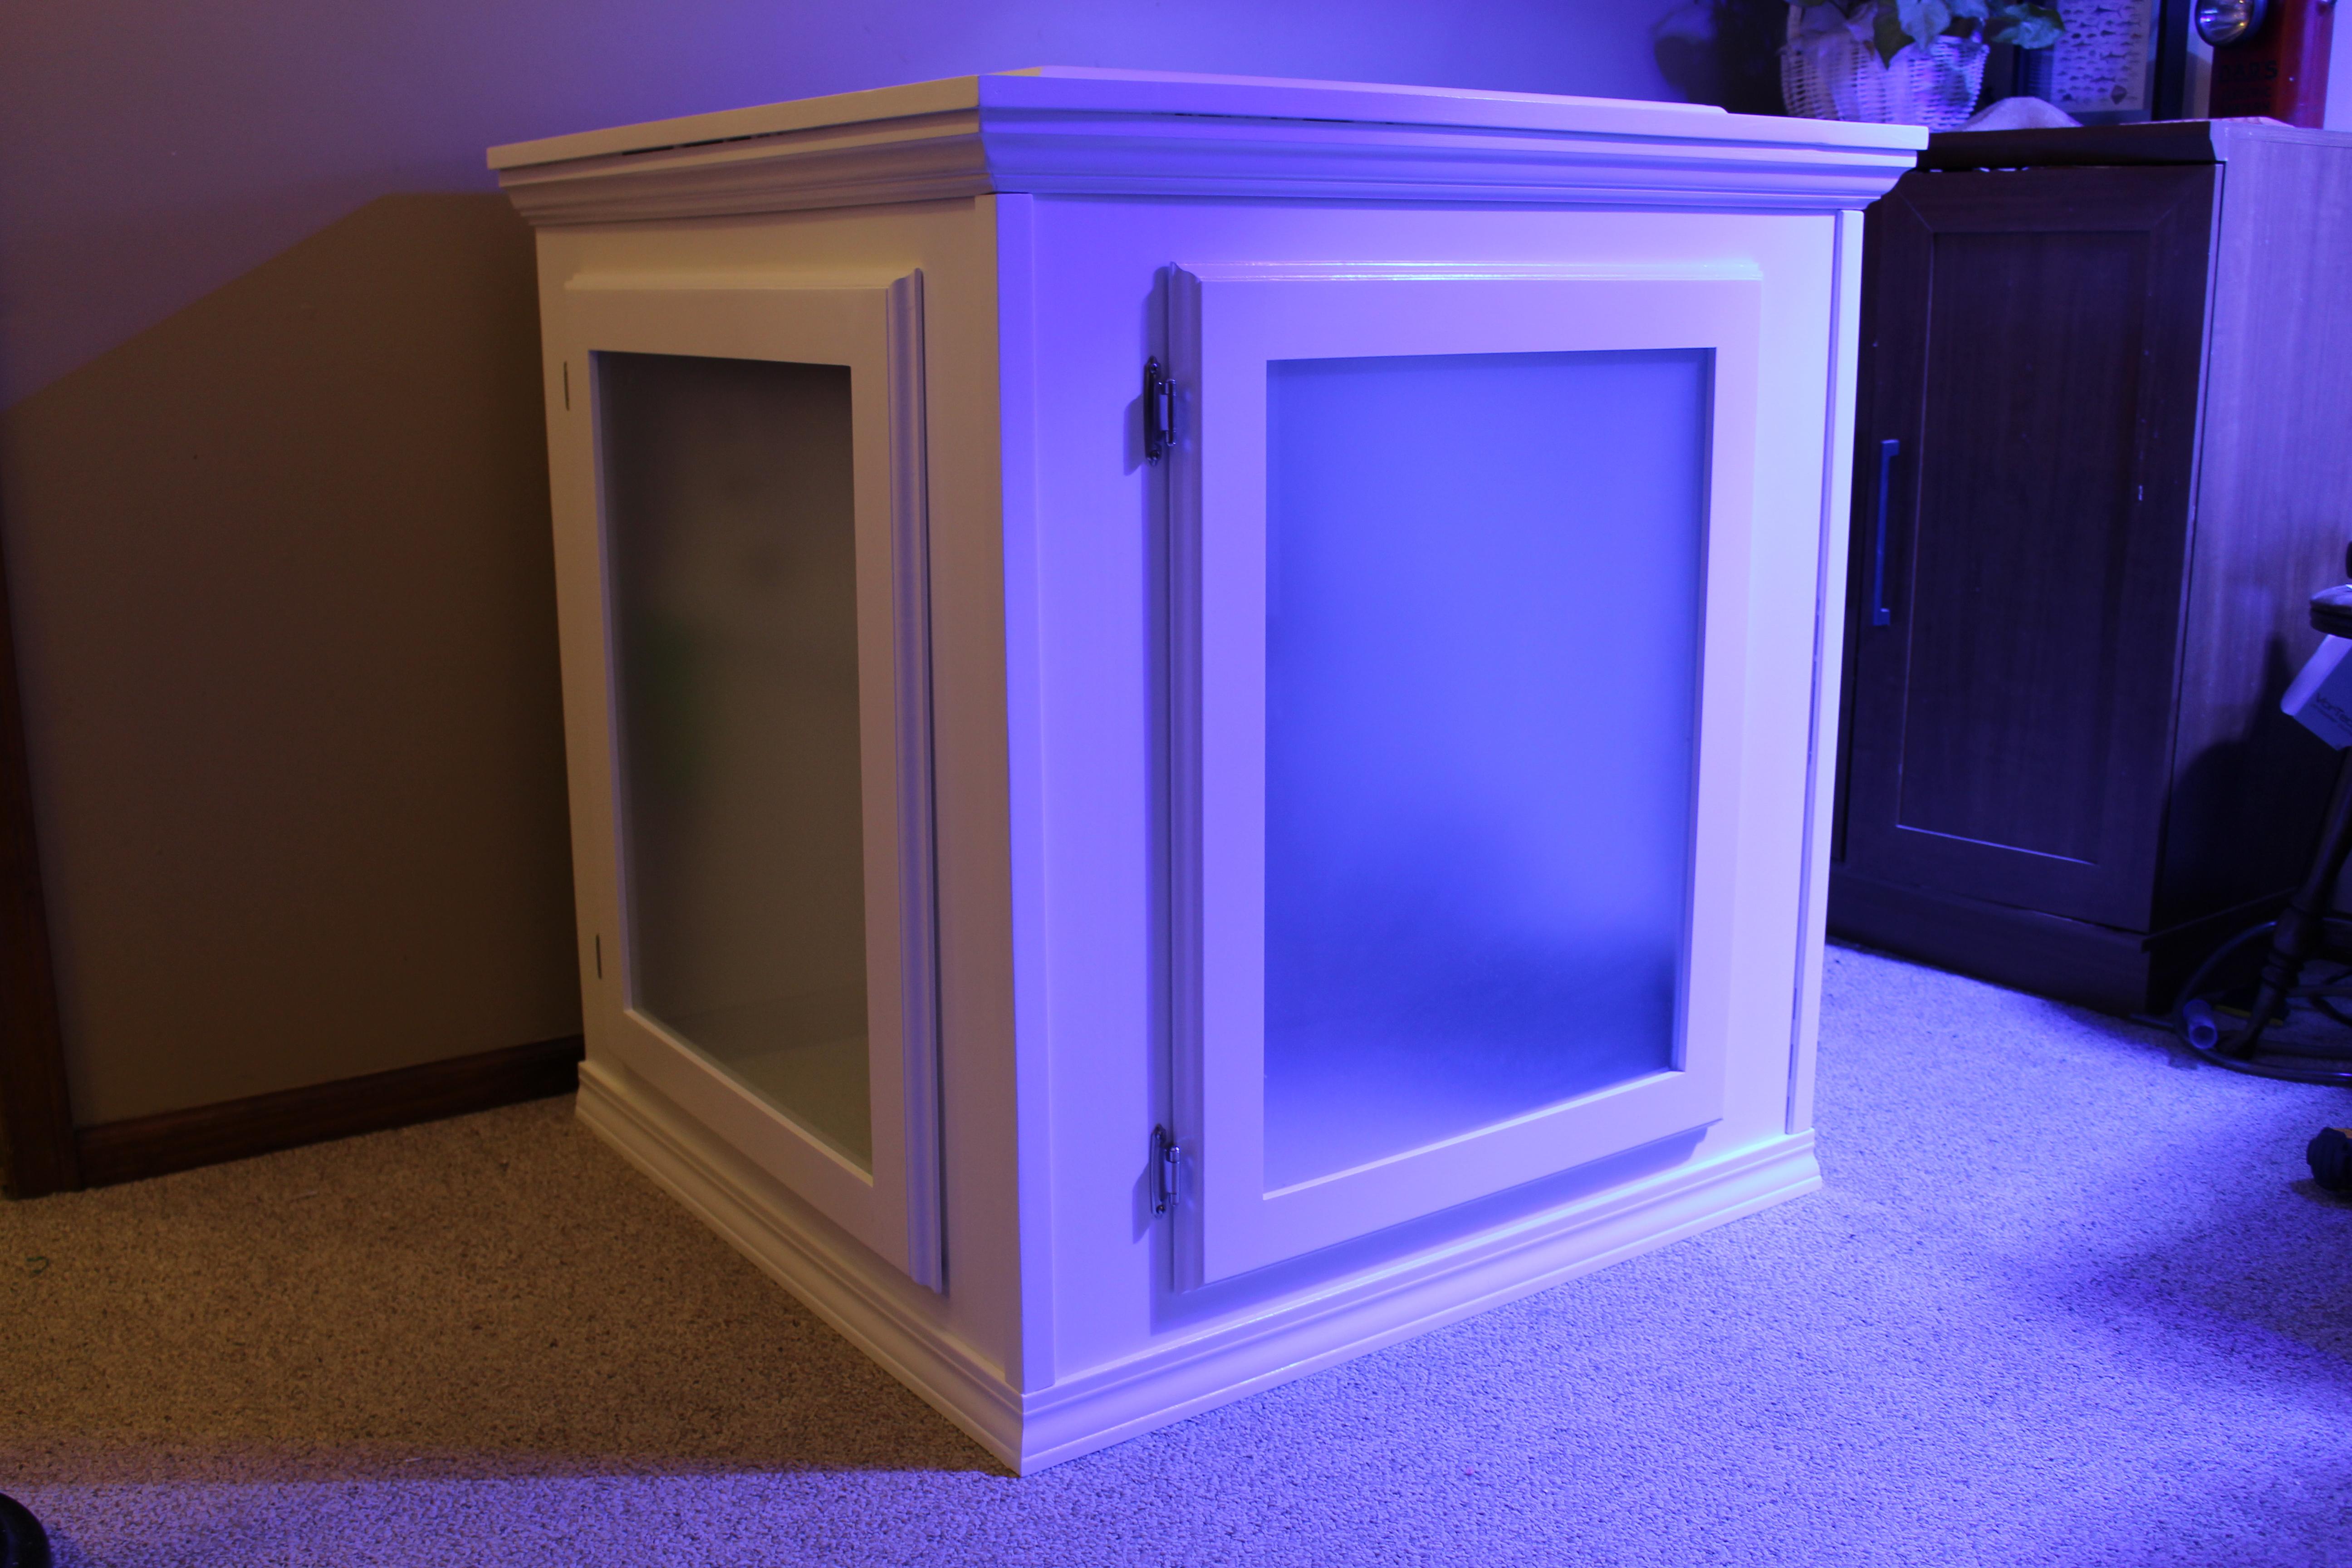 DIY: Building an Aquarium Cabinet - REEFEDITION